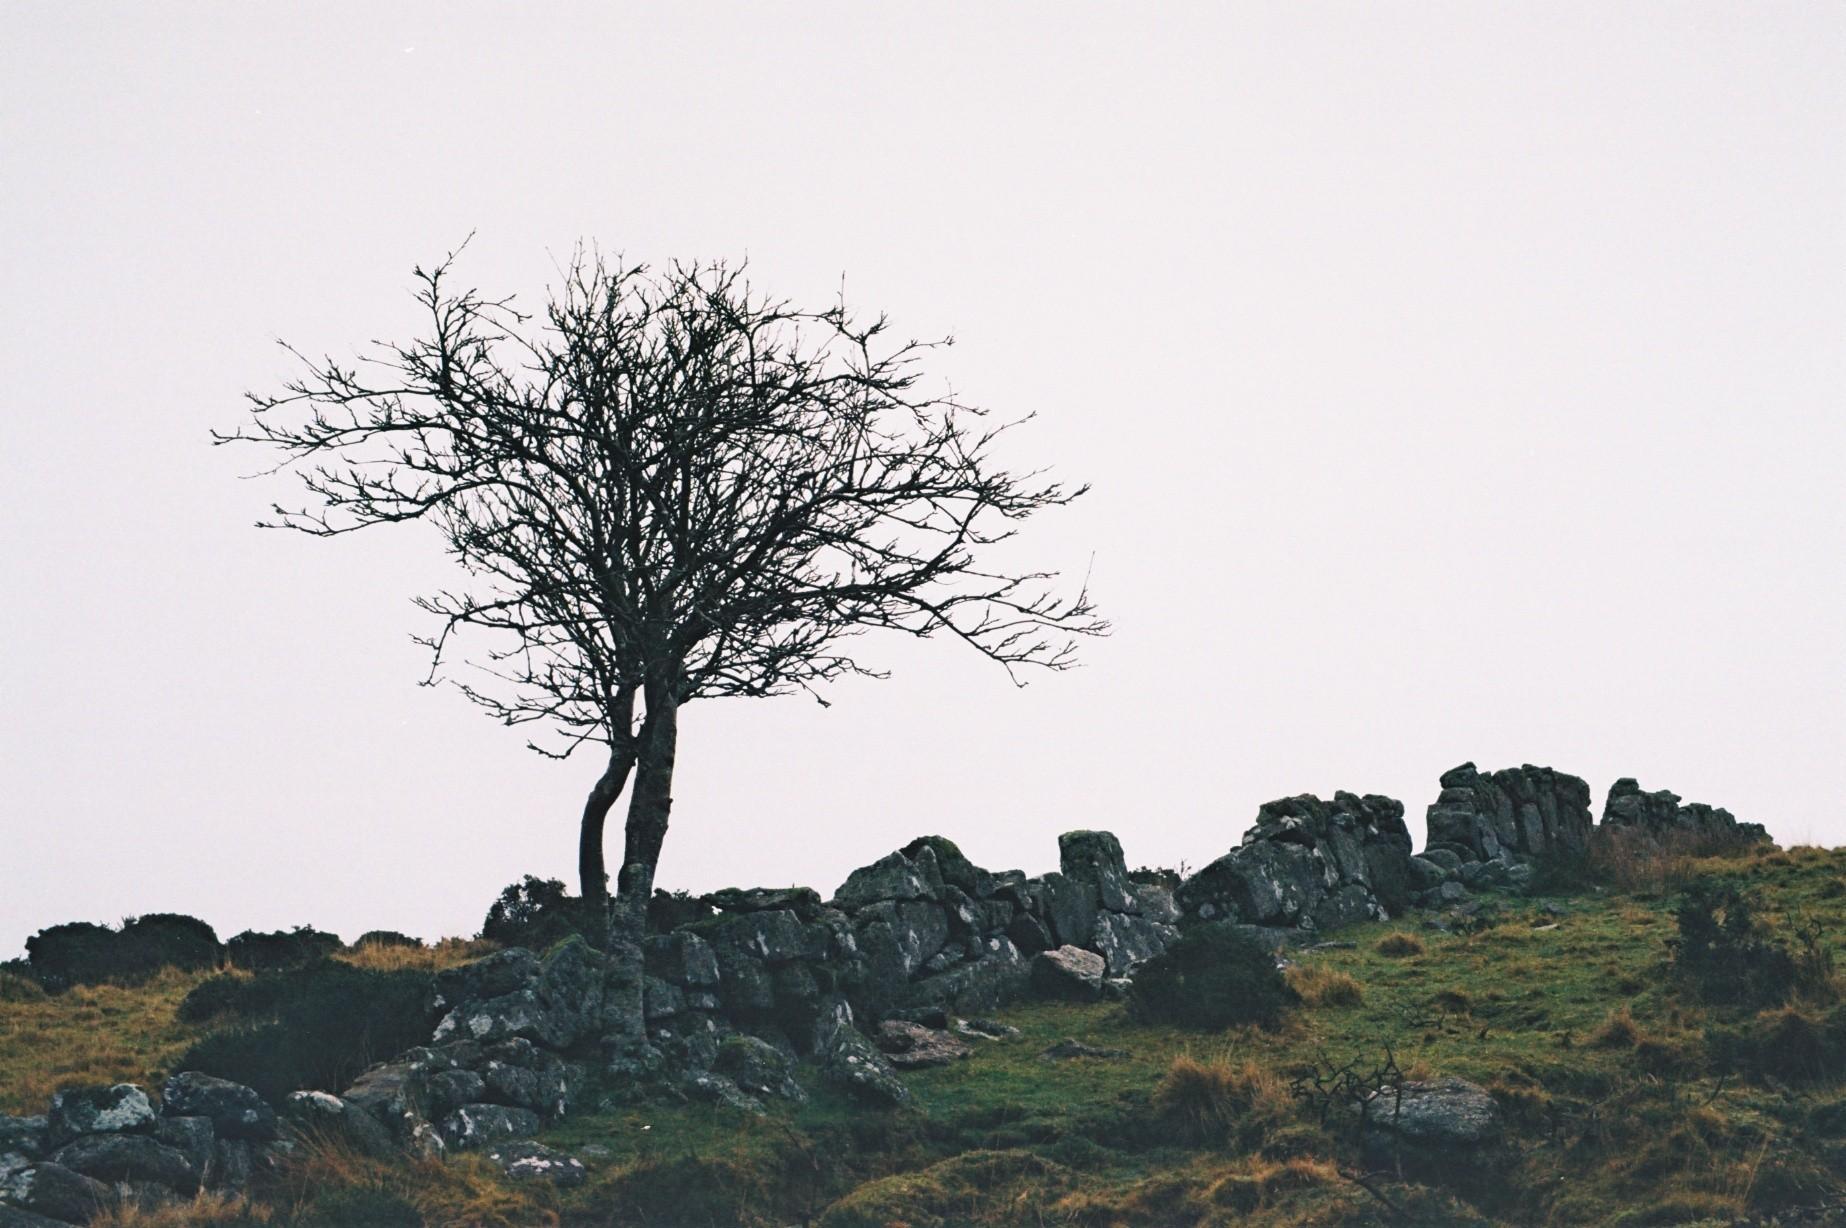 A late December Wander on Dartmoor, Devon